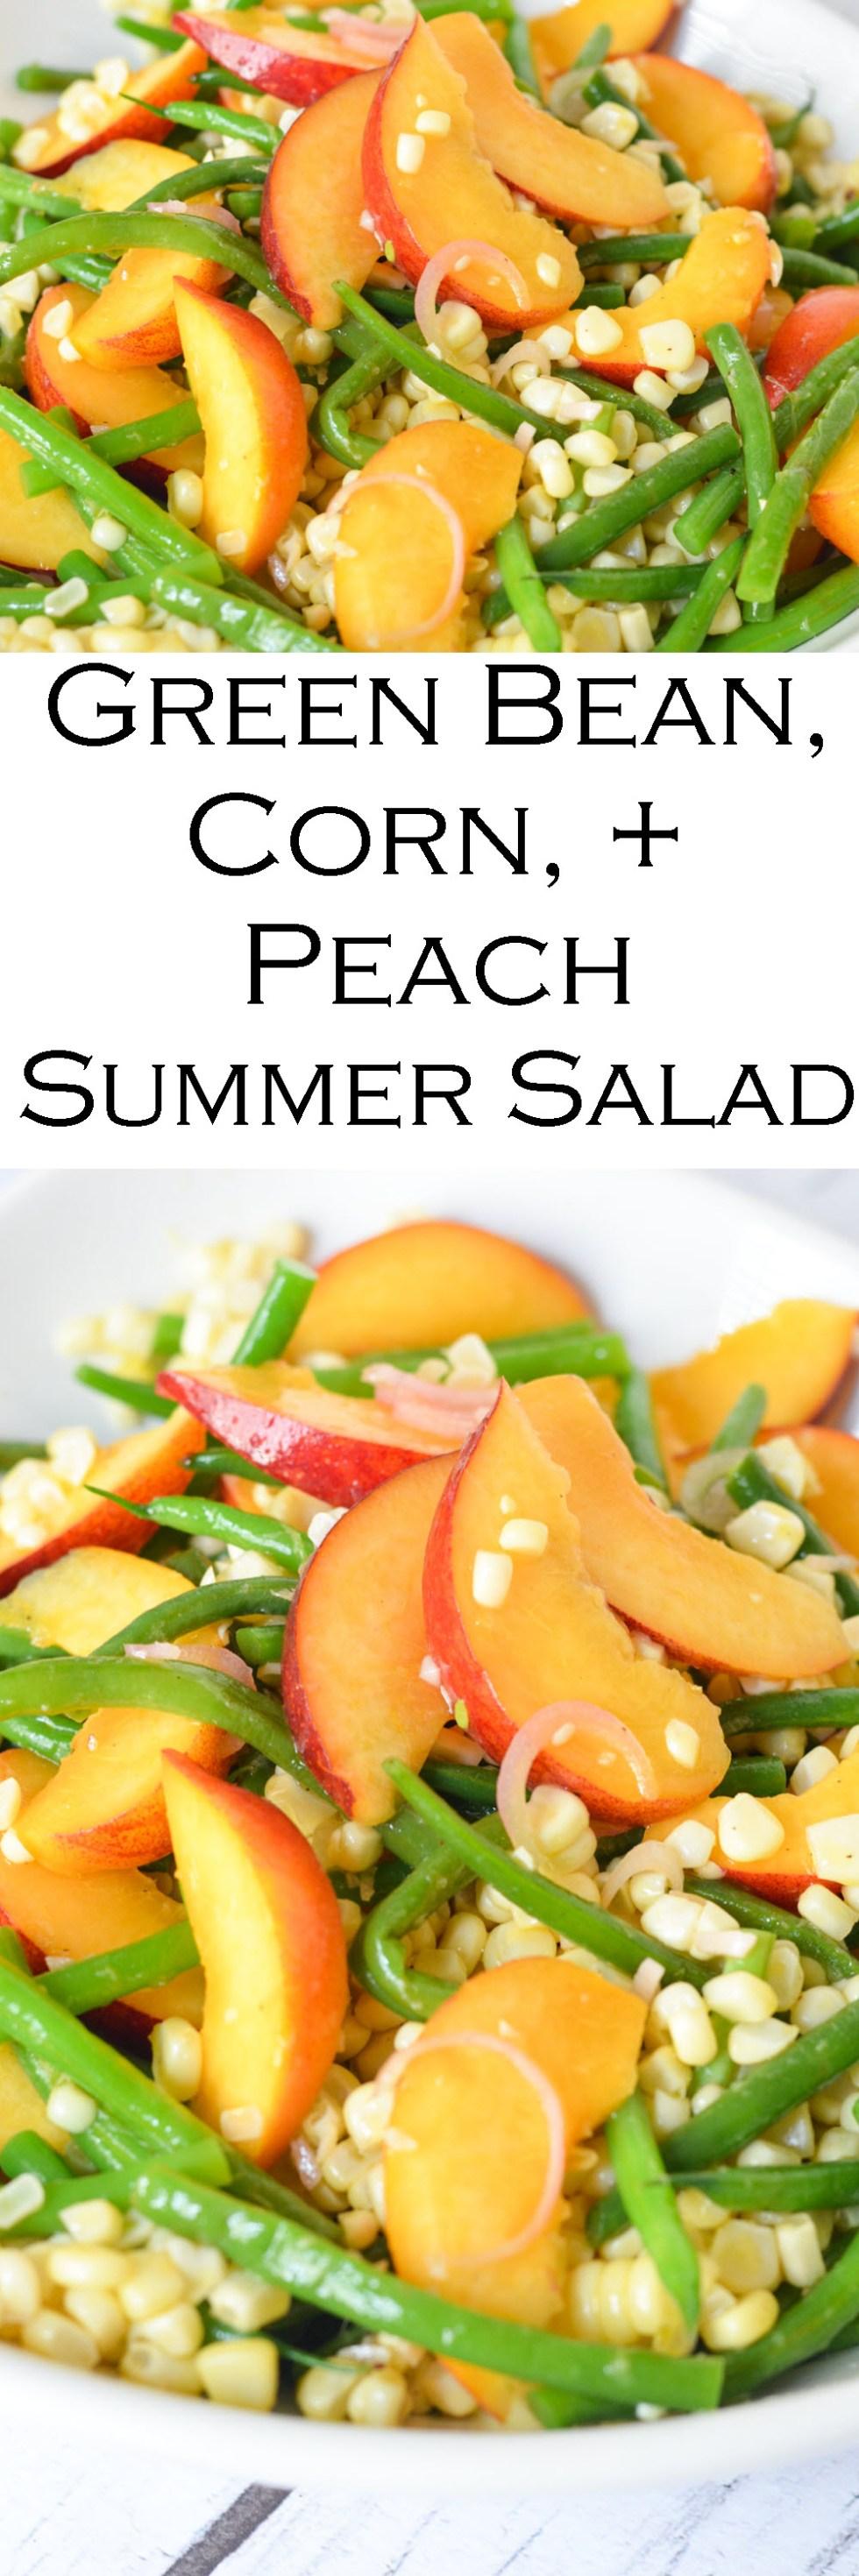 Green Bean, Peach, Corn Salad with Summer Fruits and Vegetables. Green Bean, Peach, Corn Salad with Summer Fruits and Vegetables. #healthy #foodblog #sidedish #potluck #july4 #bbq #homemade #corn #peaches #greenbeans #plantbased #vegan #vegetarian #healthy #lmrecipes